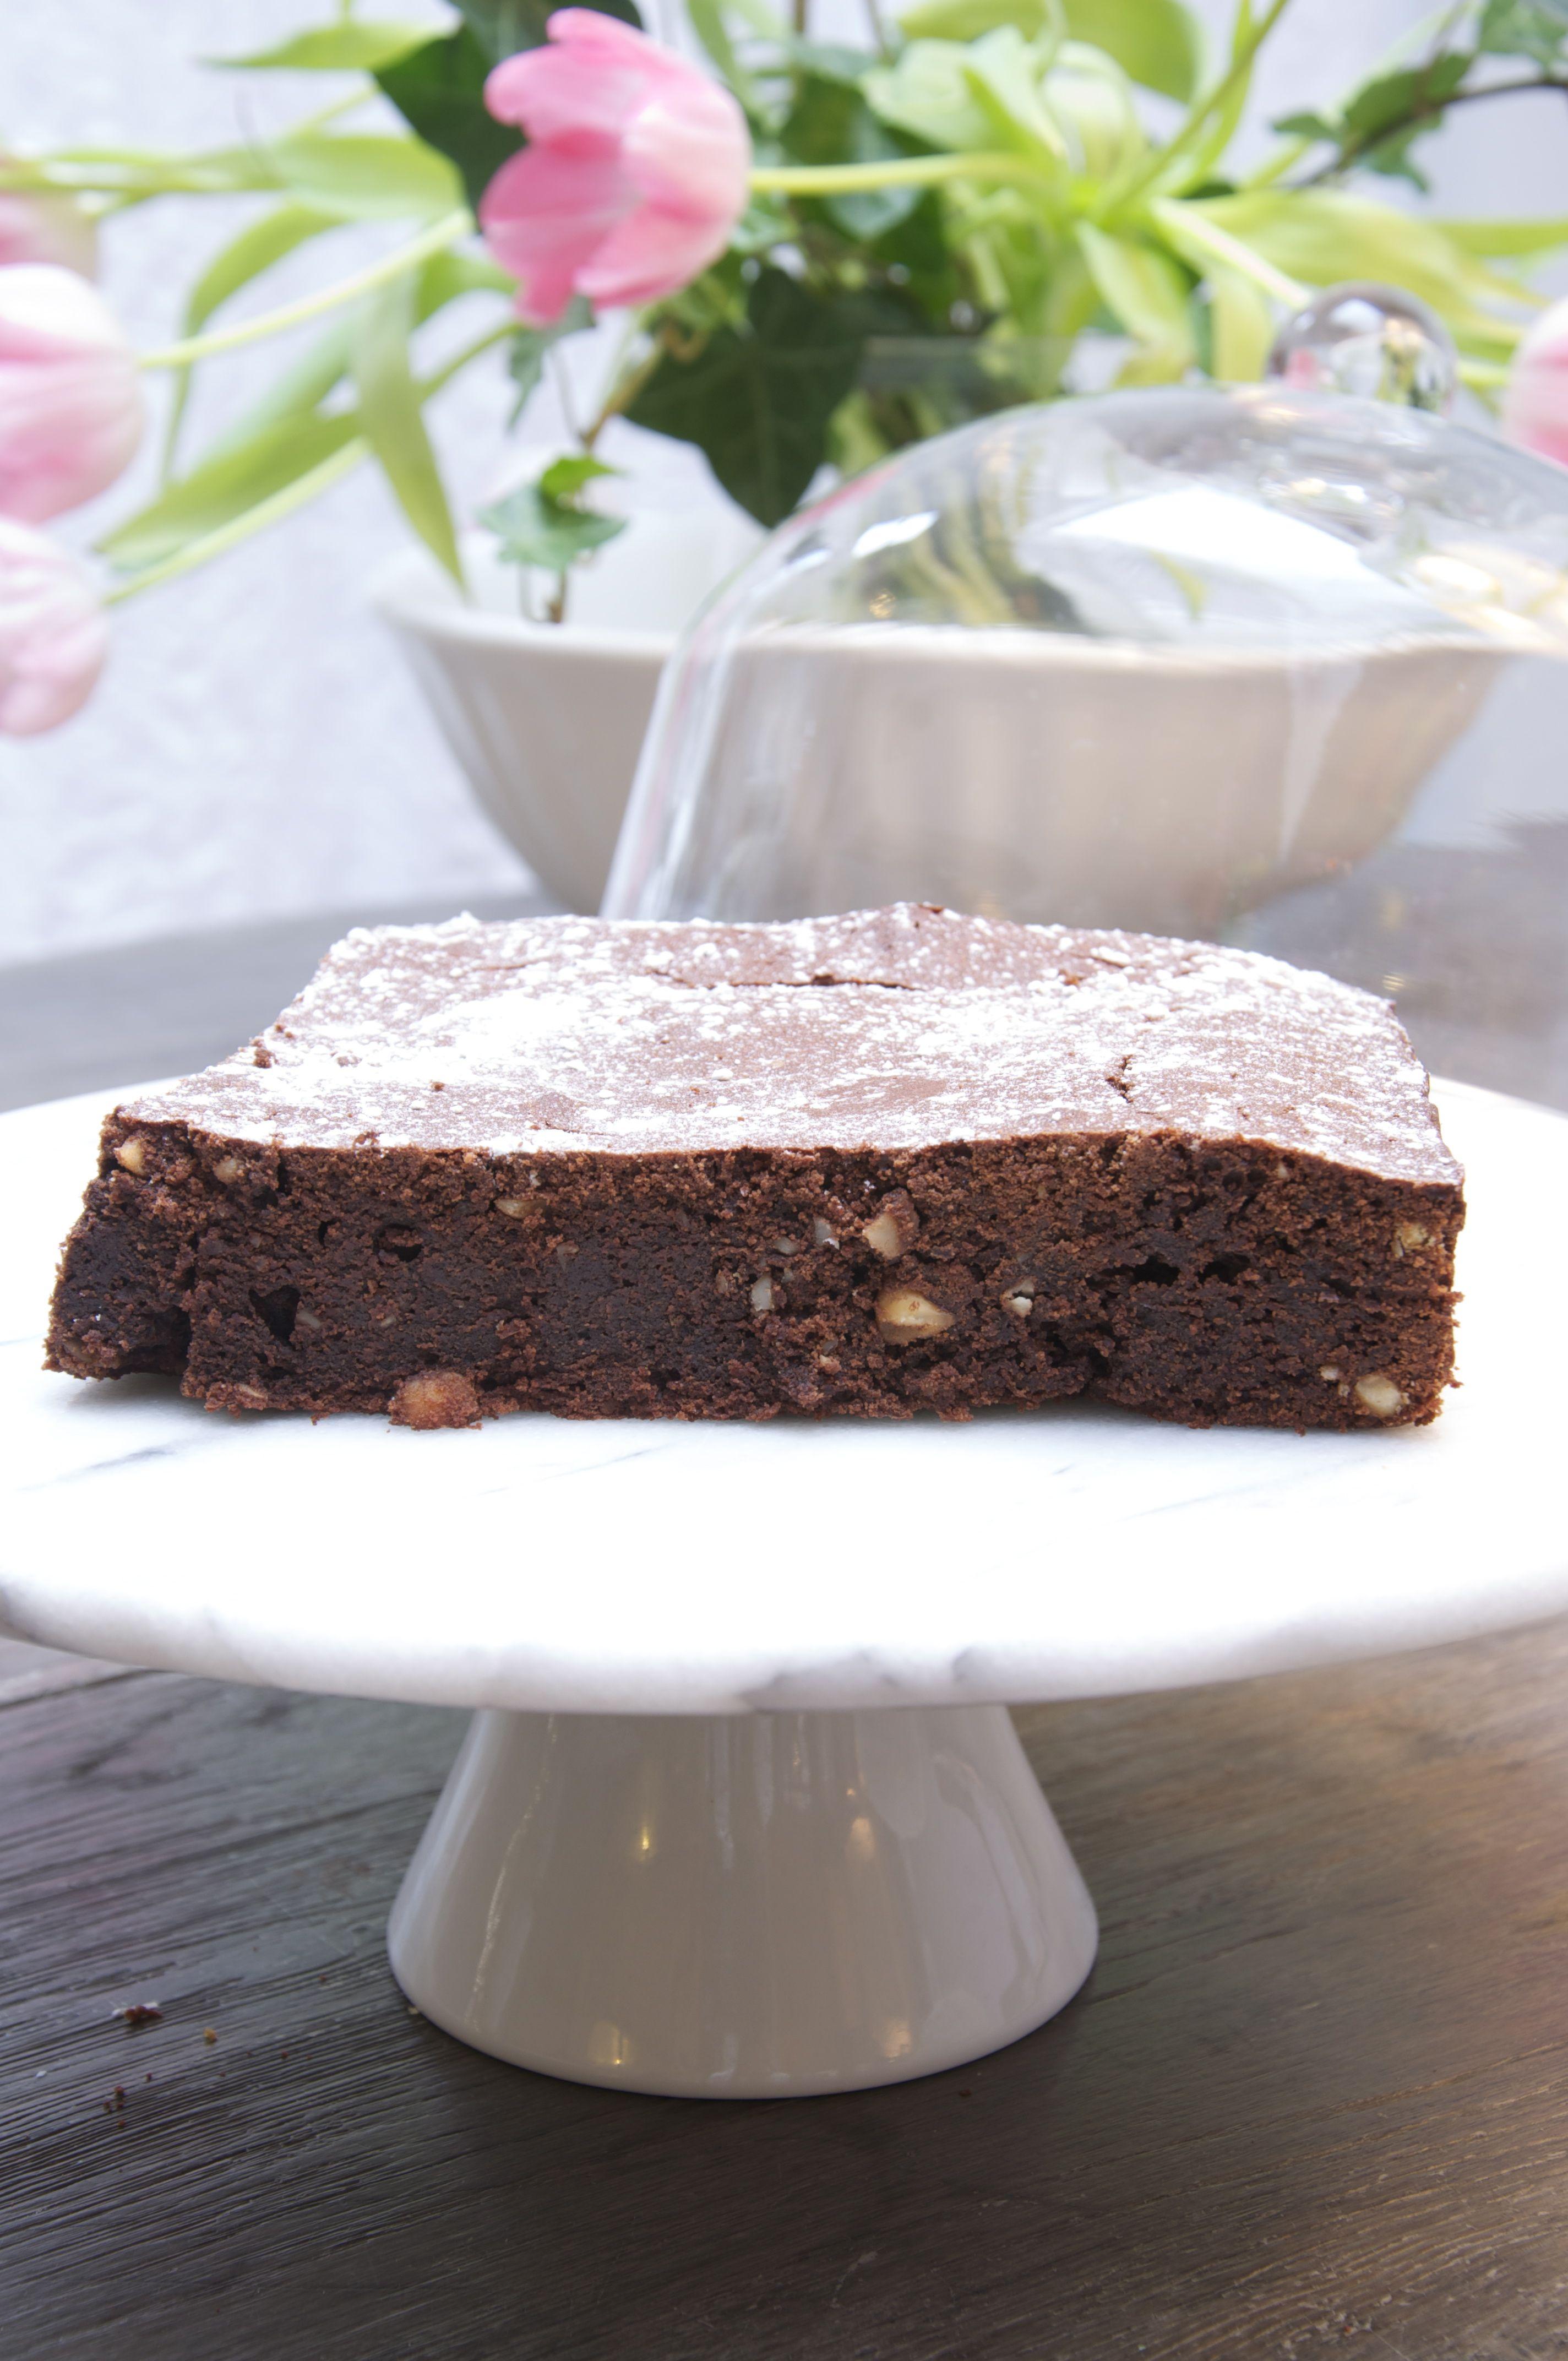 Ingrediënten:250 gr.boter, 175 gr. pure chocolade(kleine stukjes), 250 gr. basterdsuiker,  3 dl. heet water, 1 eetl. instant-koffie, handvol walnoten, 200 gr. bloem, 60 gr. zelfrijzend bakmeel, 60...